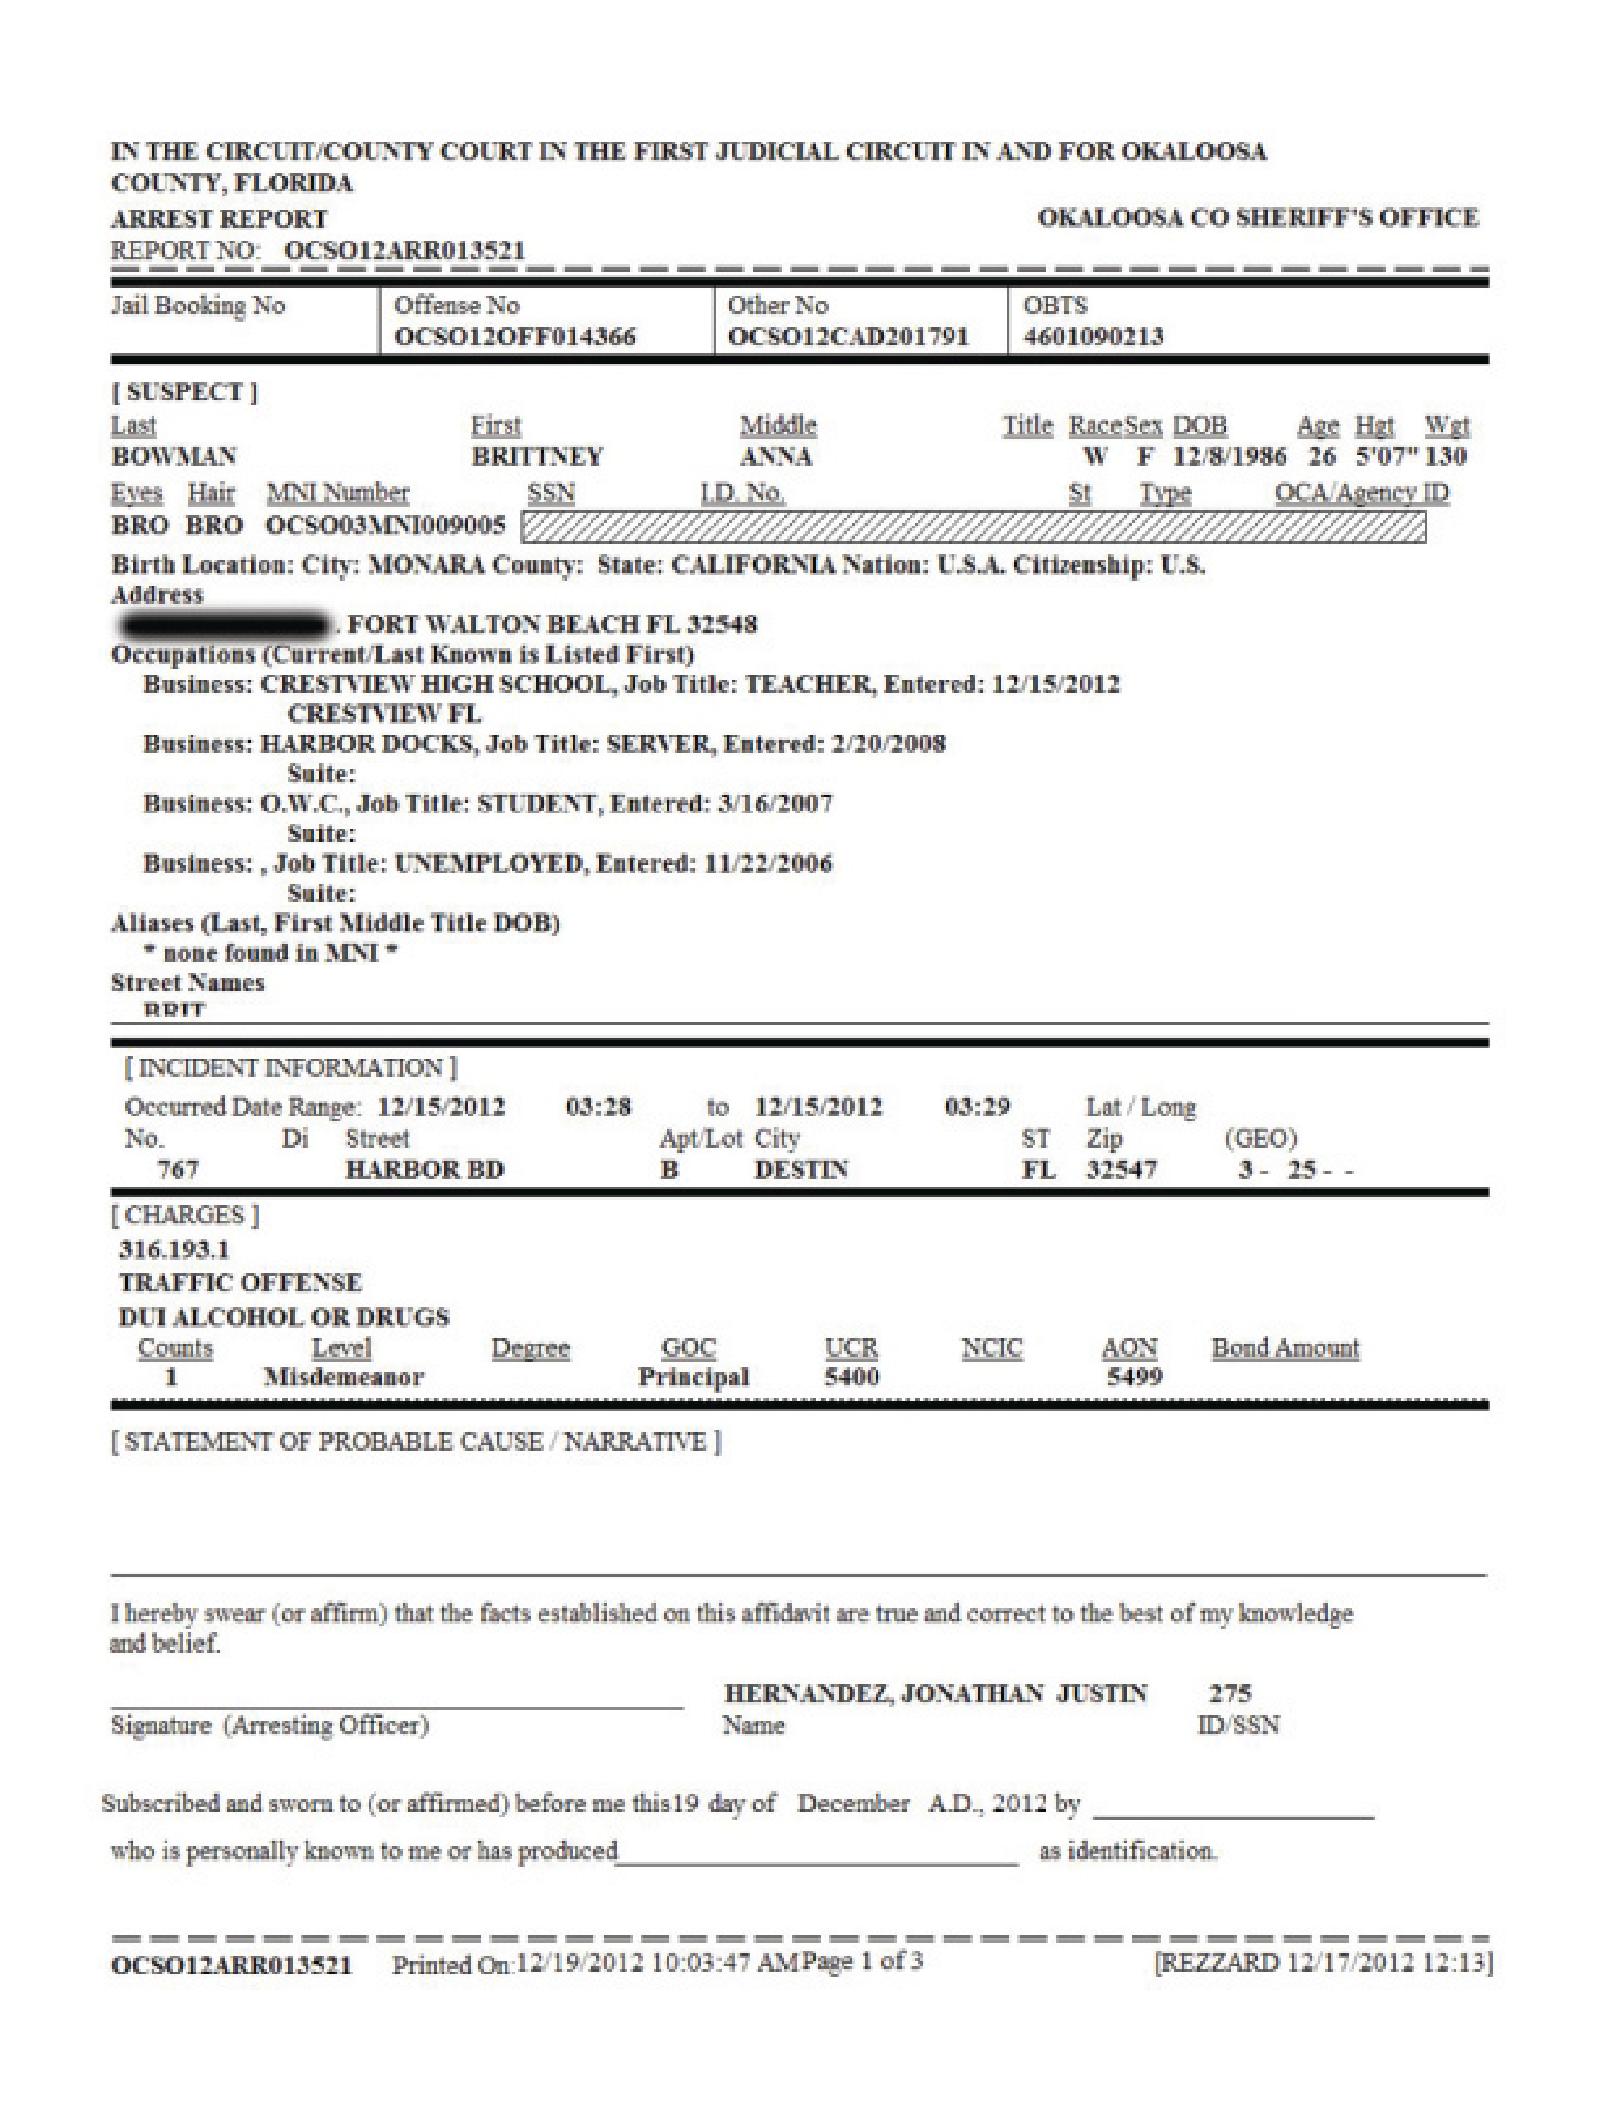 Copy of bowman brittne arrest report1.png